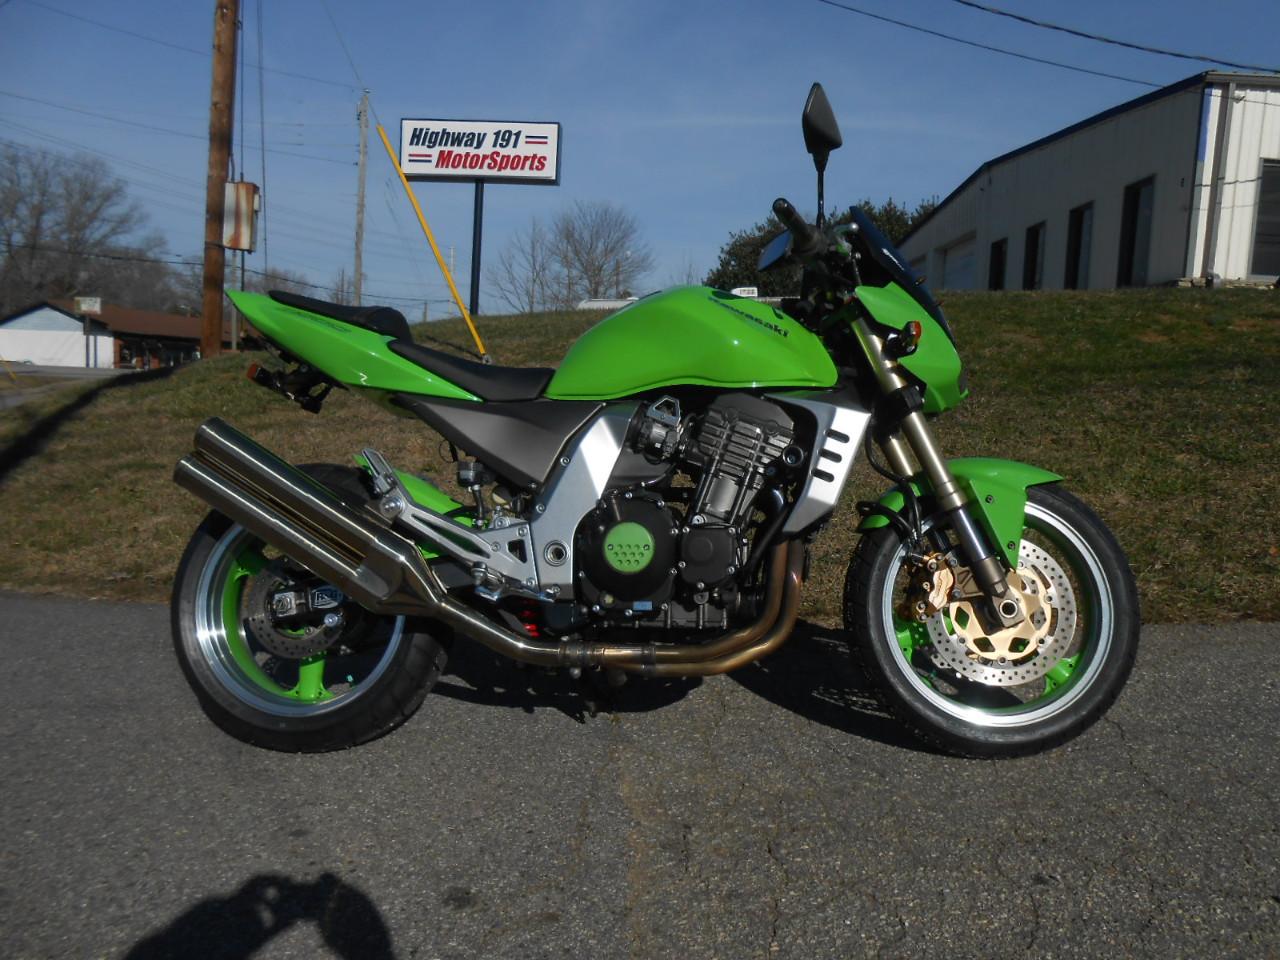 Suzuki Motorcycle Dealers Cape Town